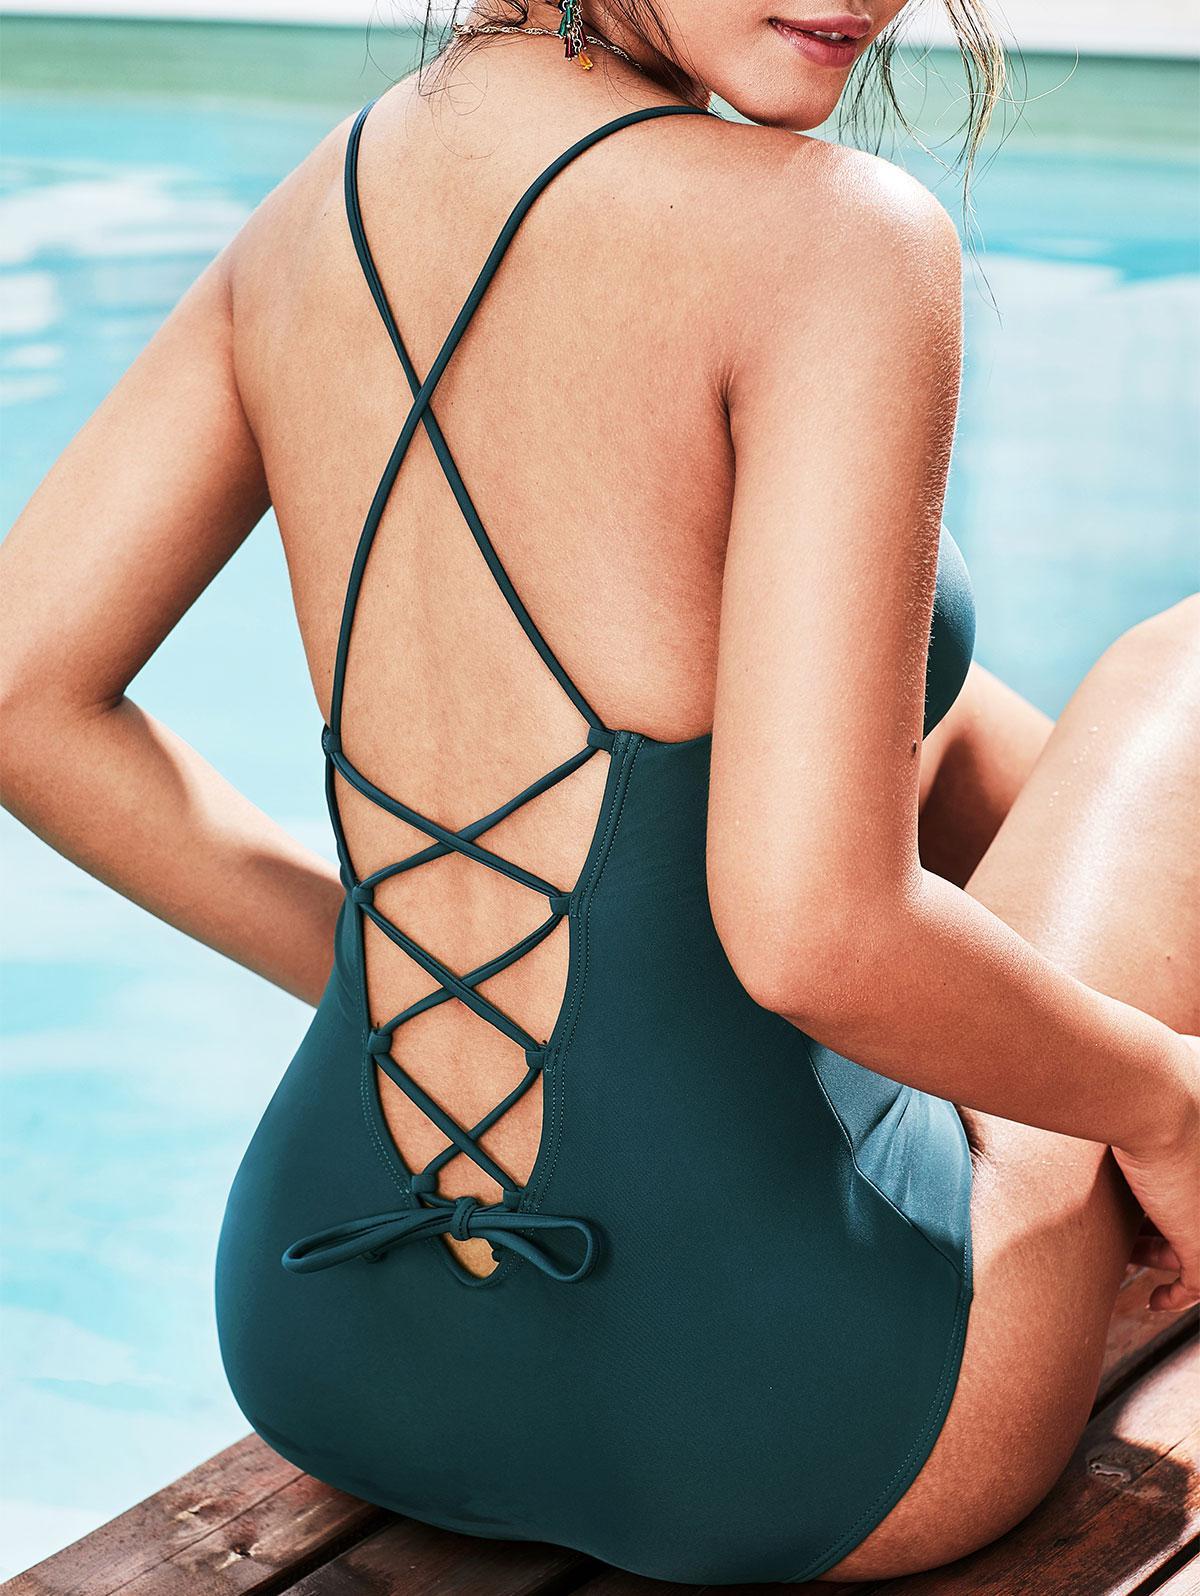 ZAFUL Lace Up Padded One-piece Swimsuit thumbnail